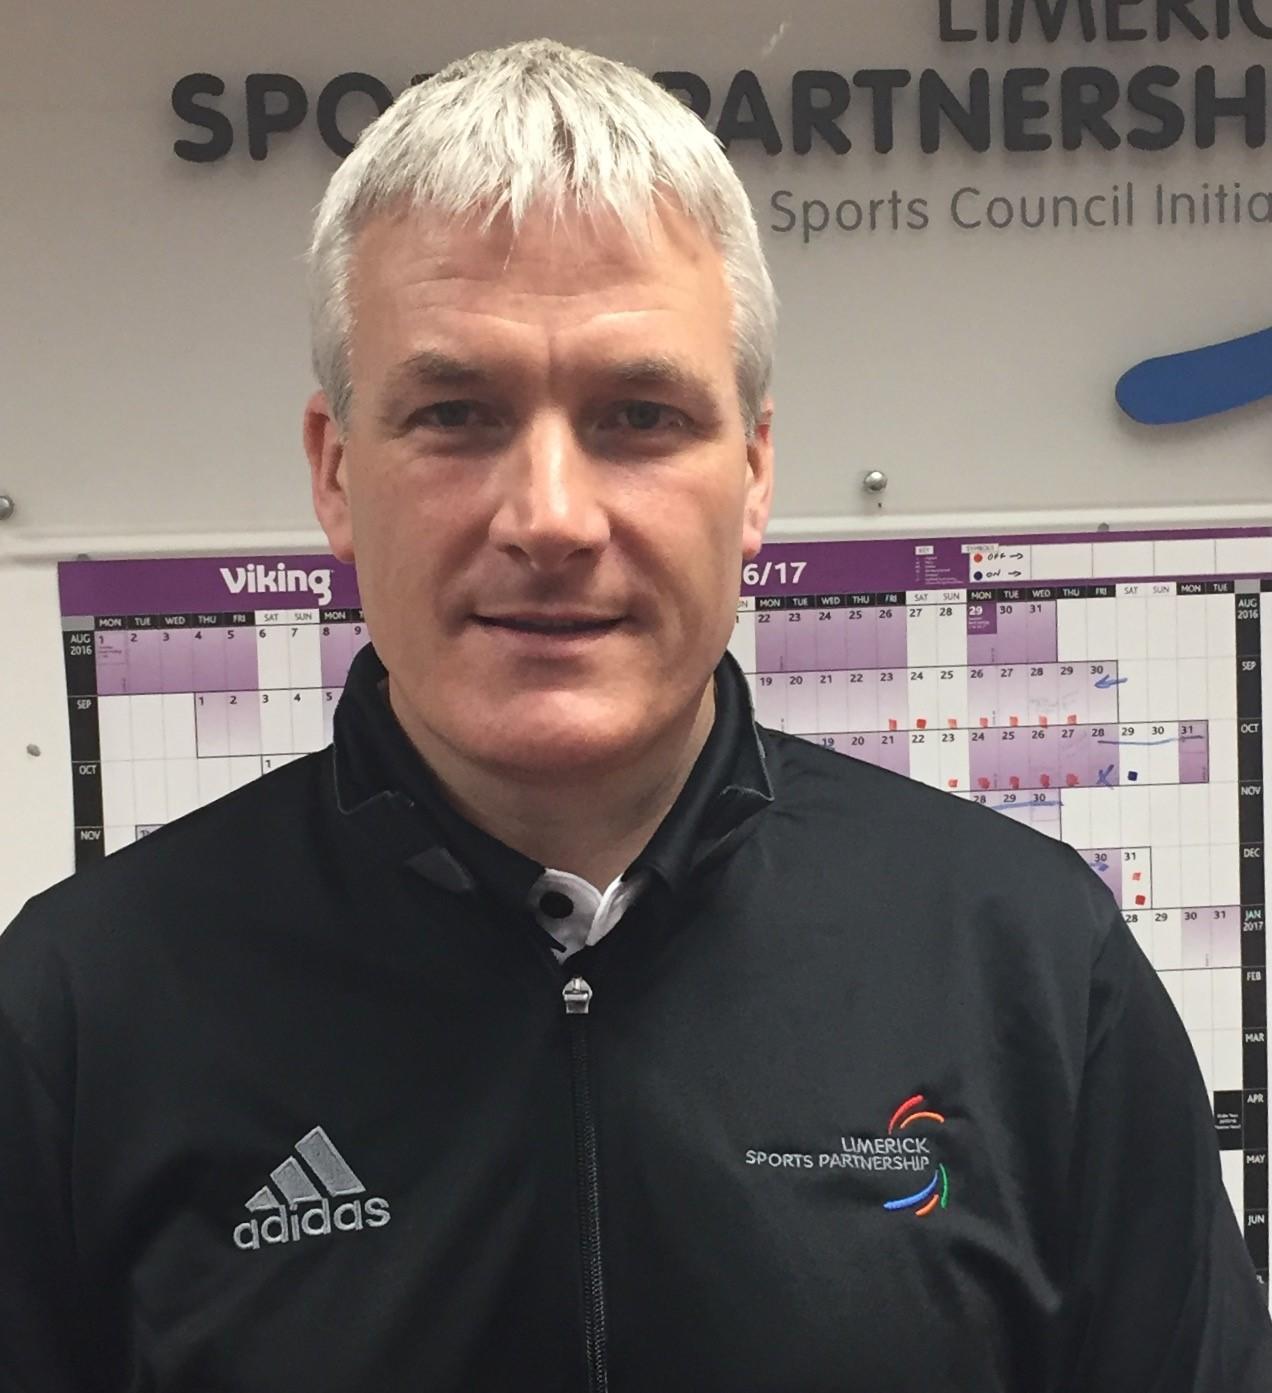 Limerick Sports Partnership Coordinator, Phelim Macken